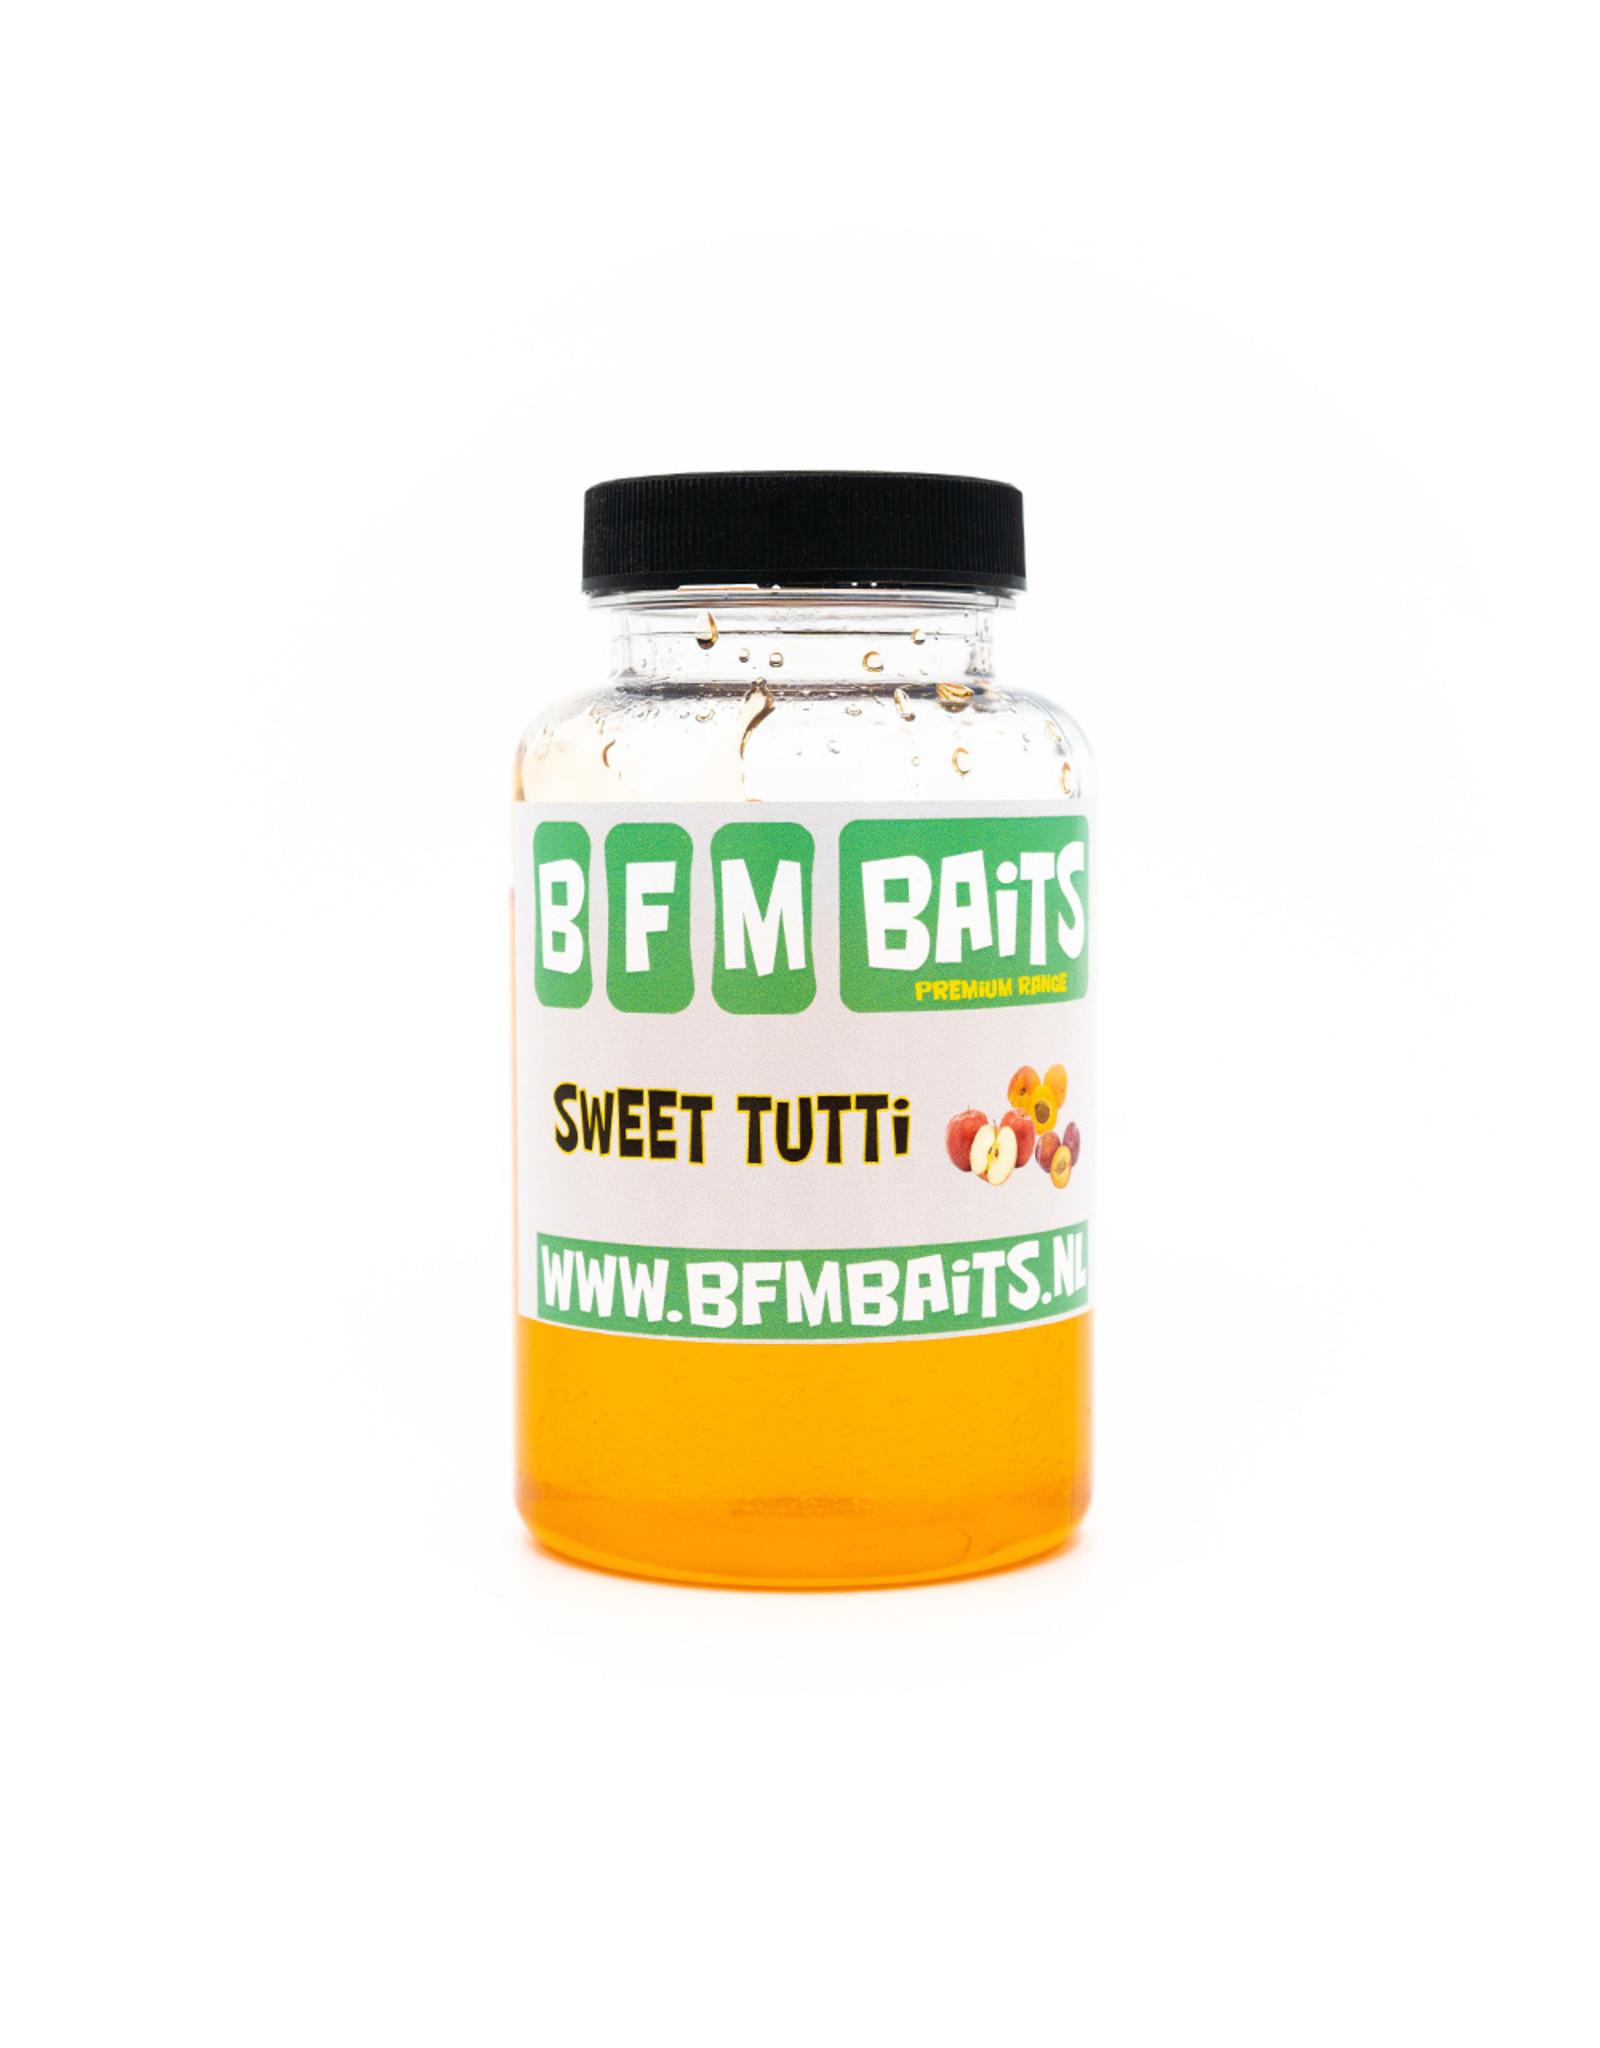 BFM Baits Sweet Tutti boilies - Bucket deal